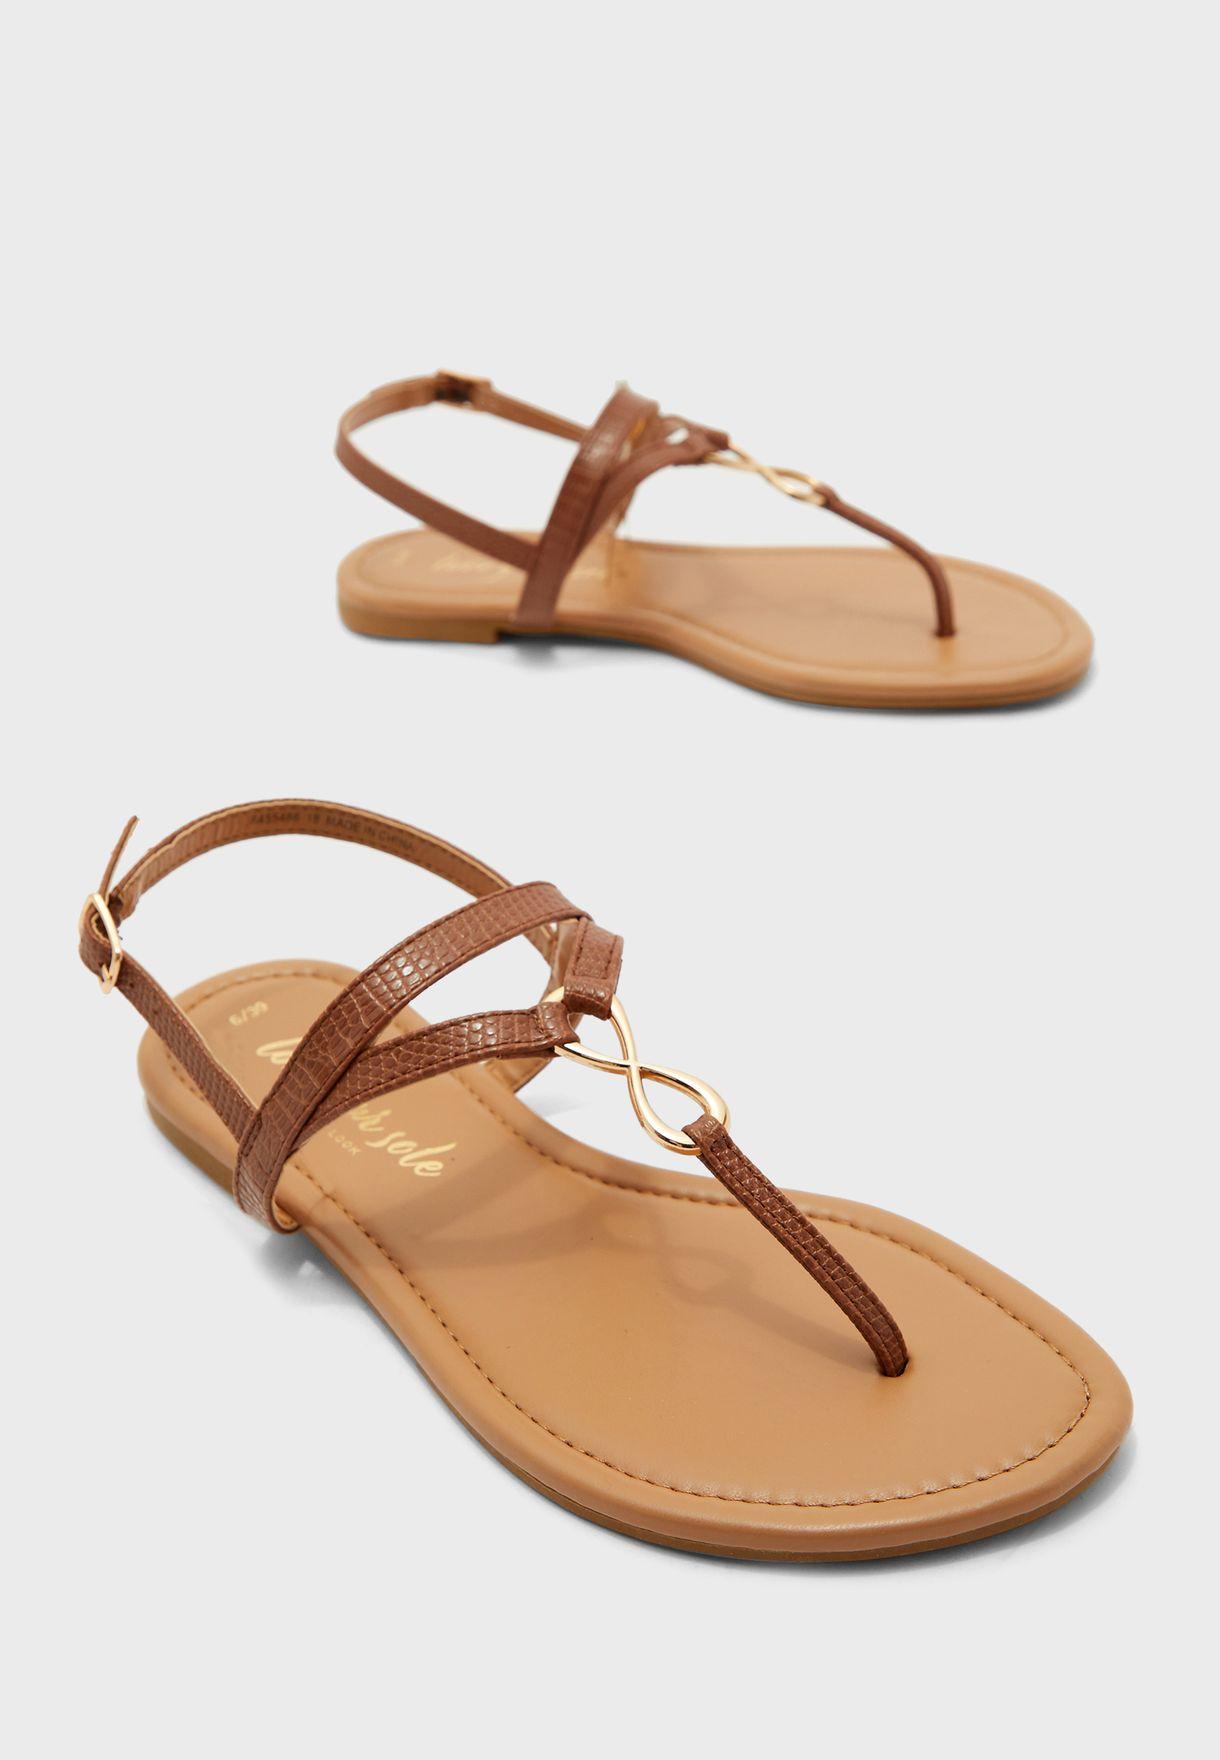 Hooper 1 Flat Sandal